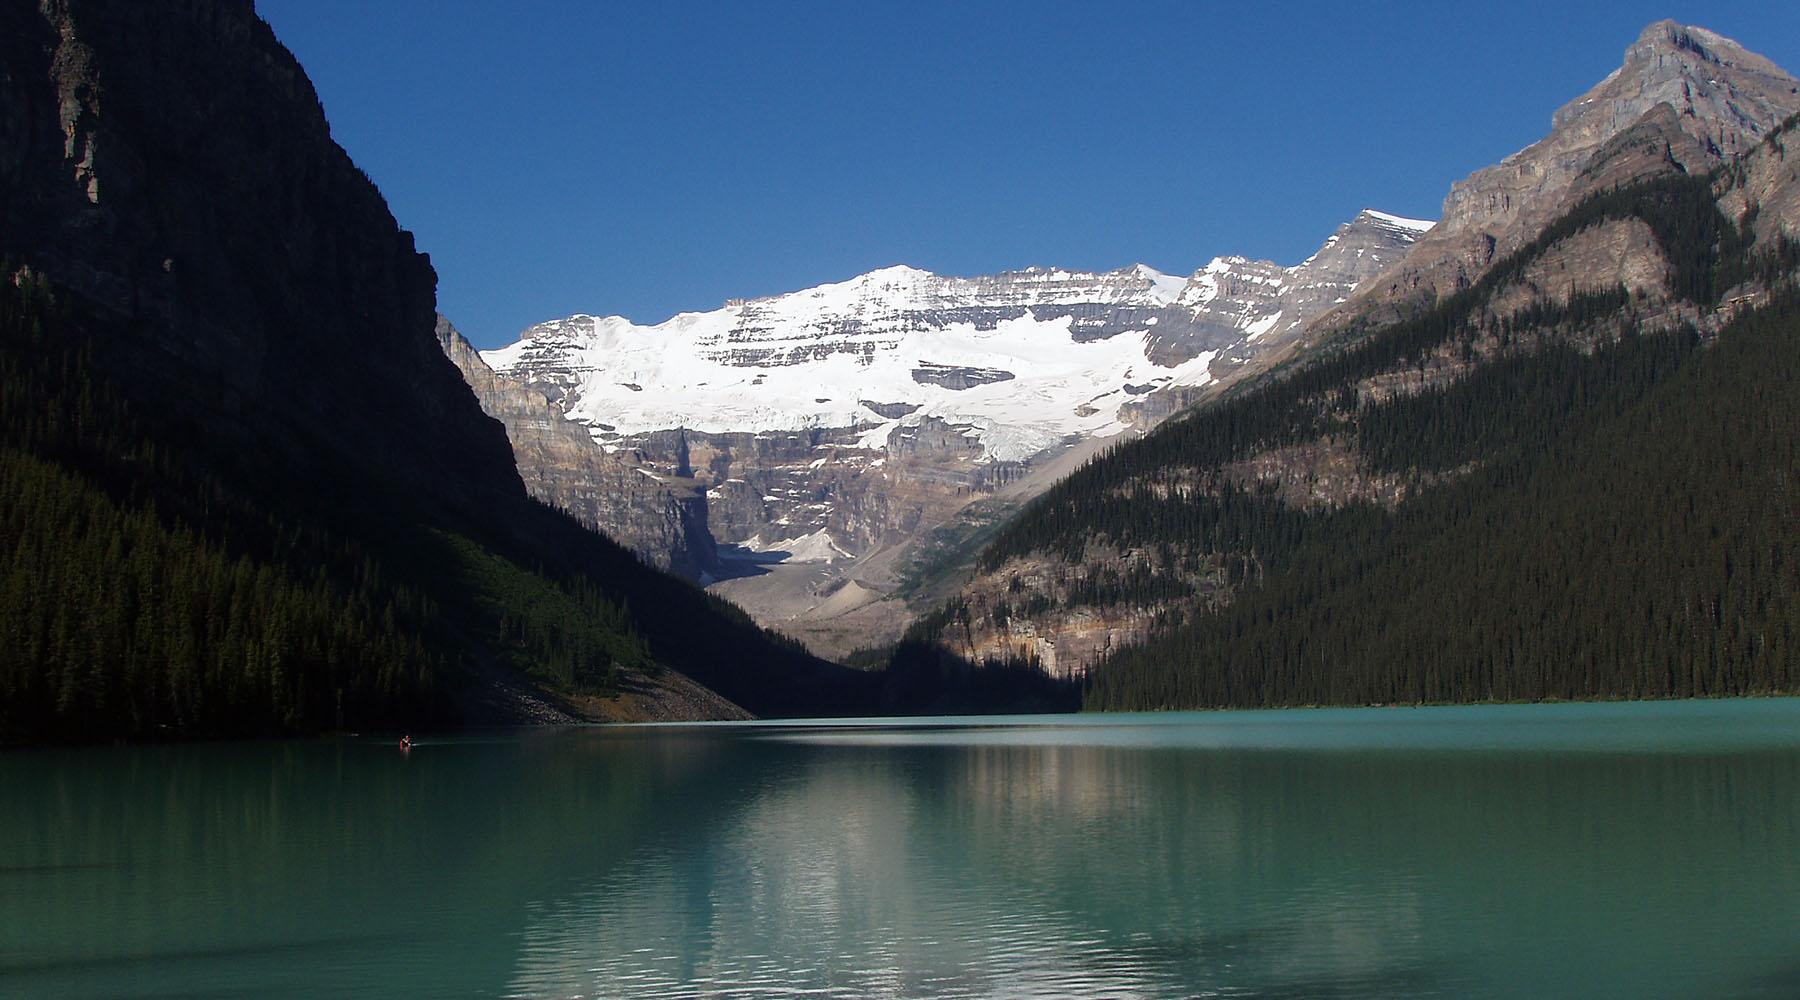 Lake Louise, Rocheuses canadiennes, Chinook voyages, aventure, randonnée, ouest canadien